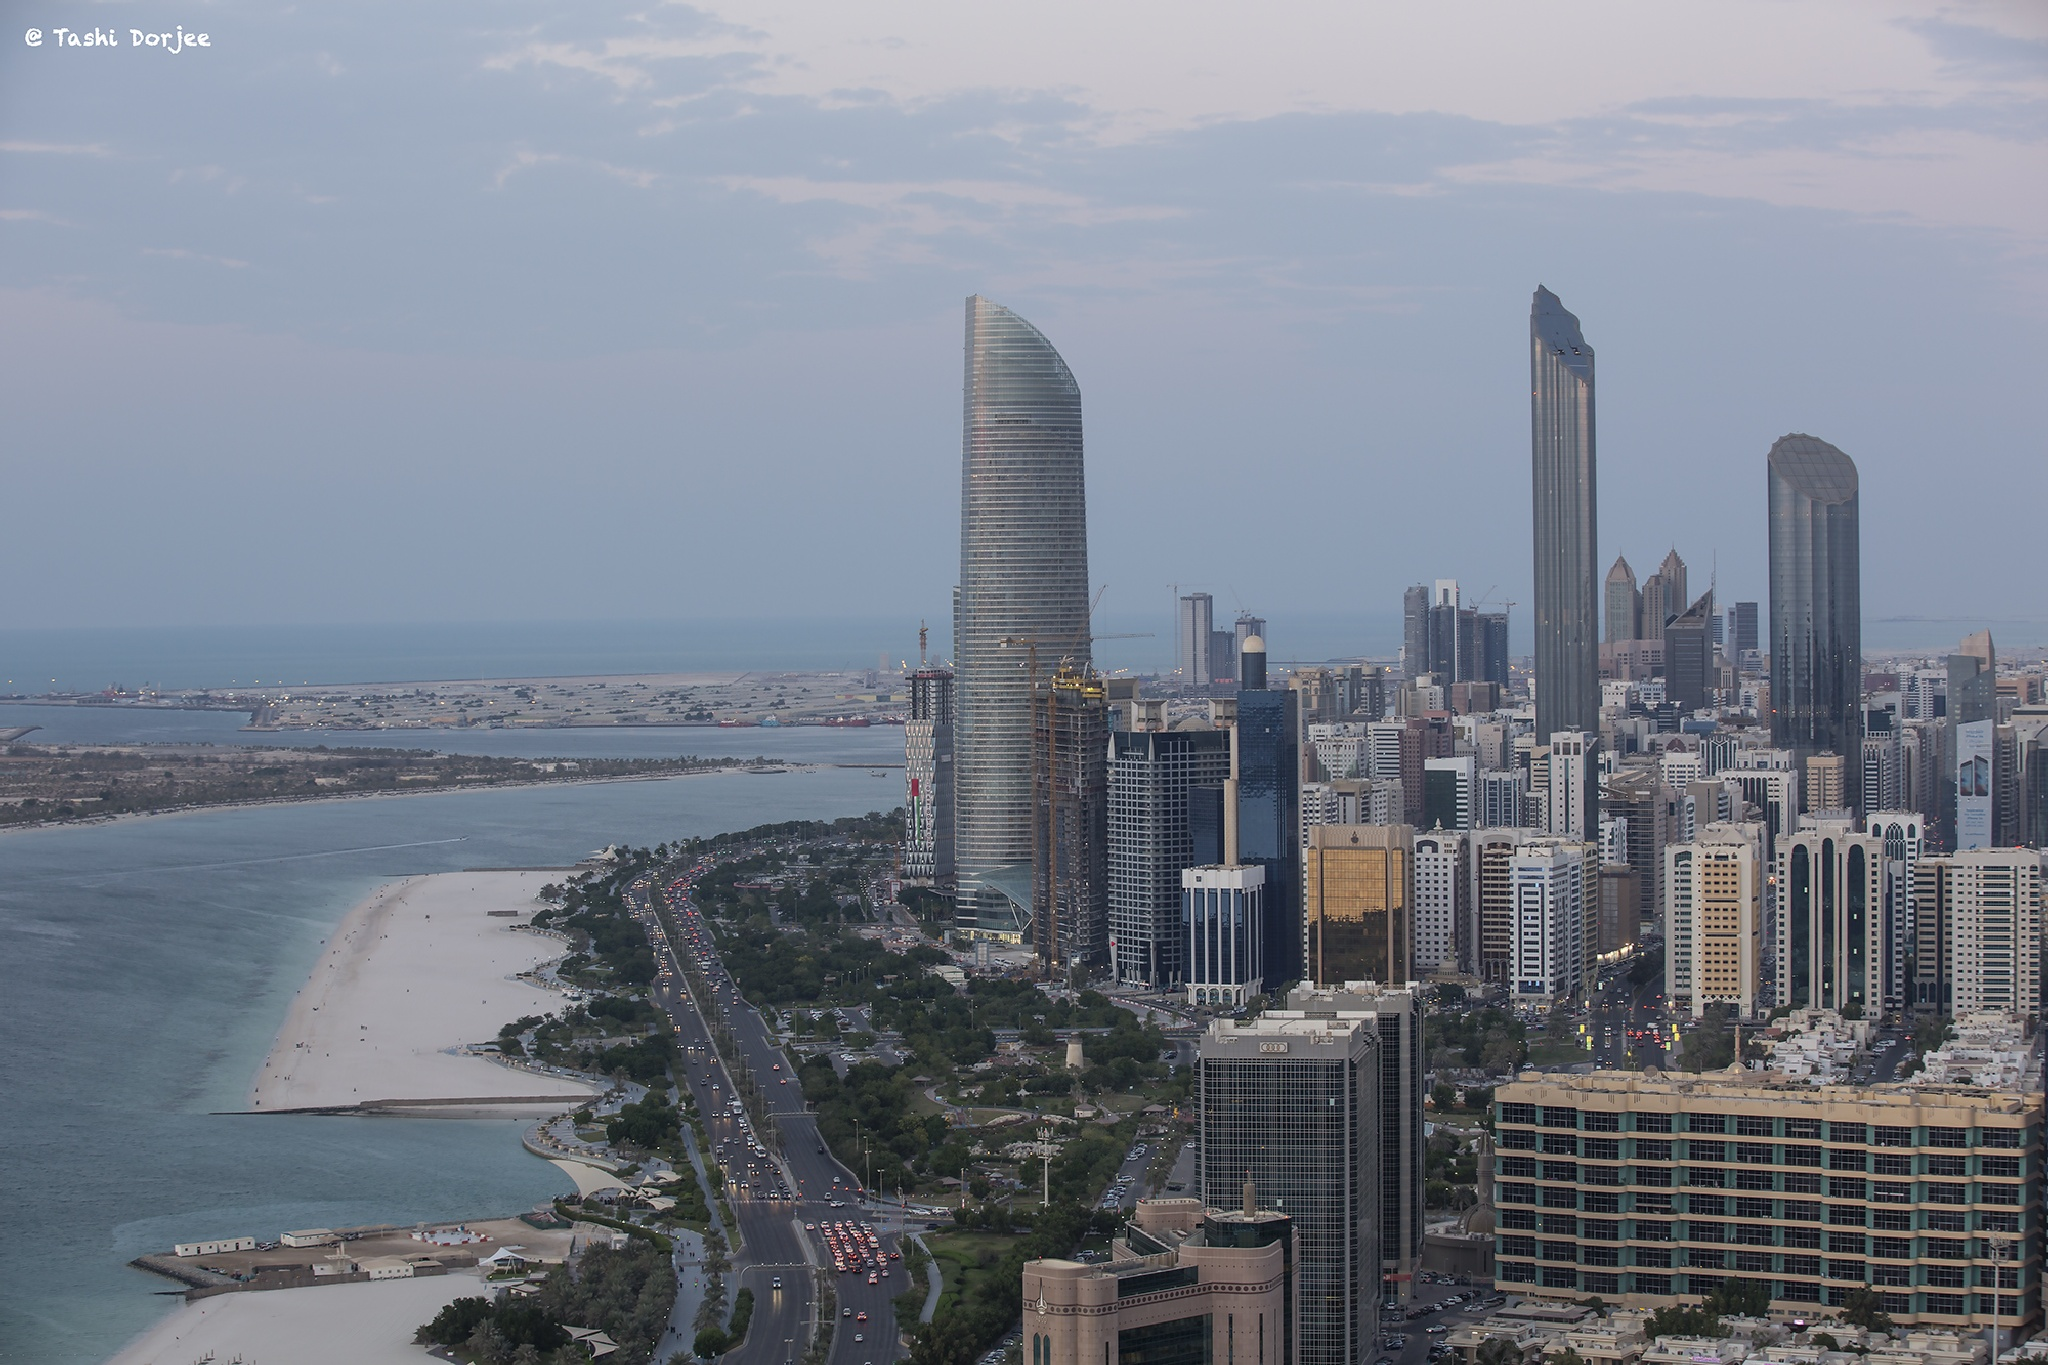 High Towers Abu Dhabi by Tibetravel Photography